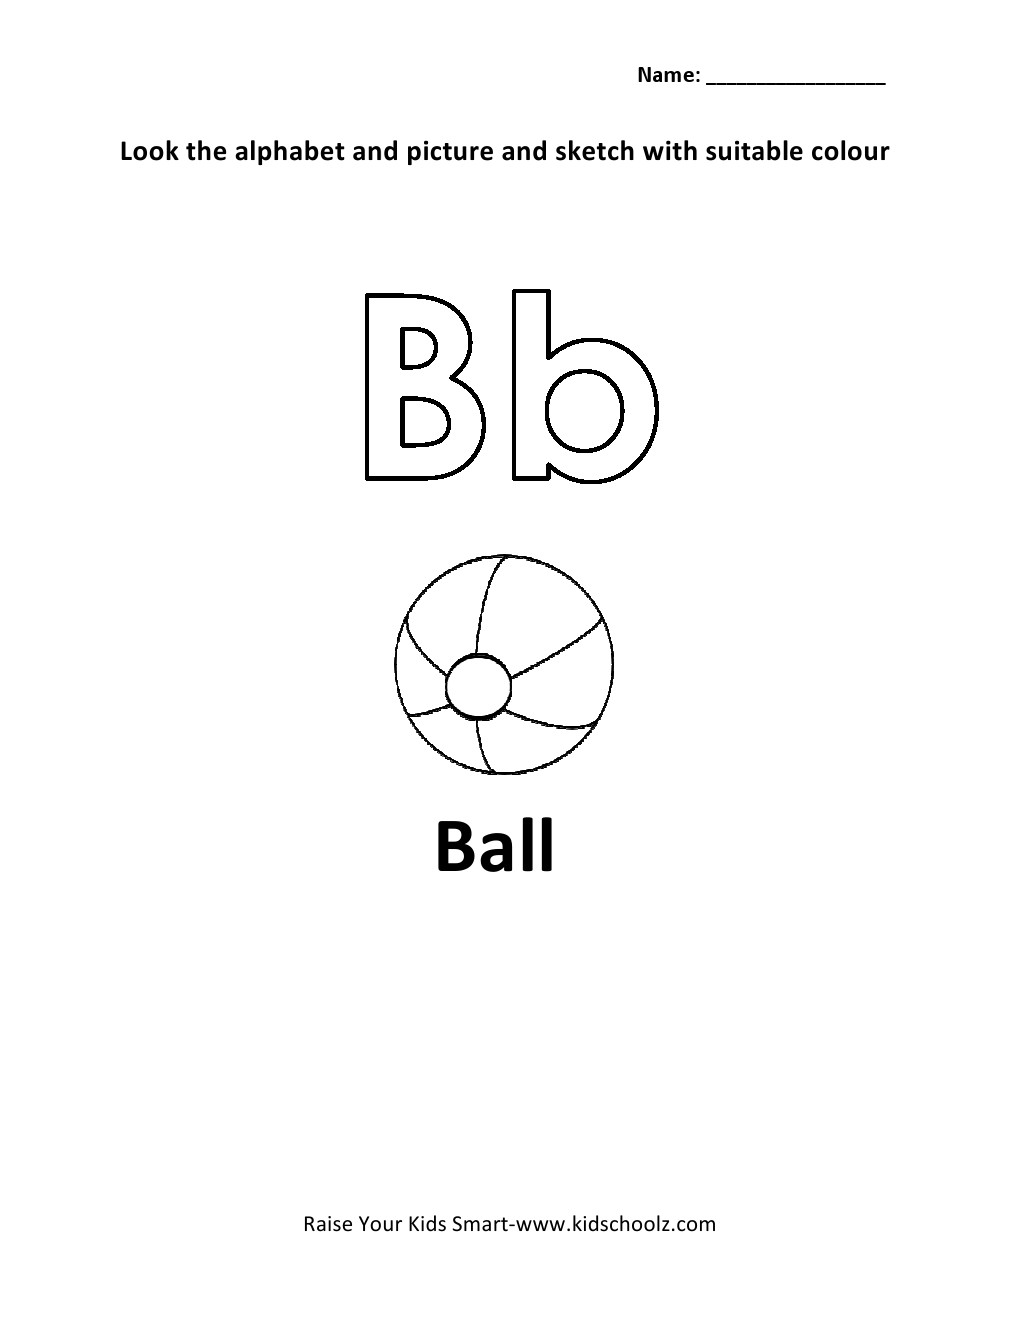 Alphabets Colouring Worksheets - B - Kidschoolz